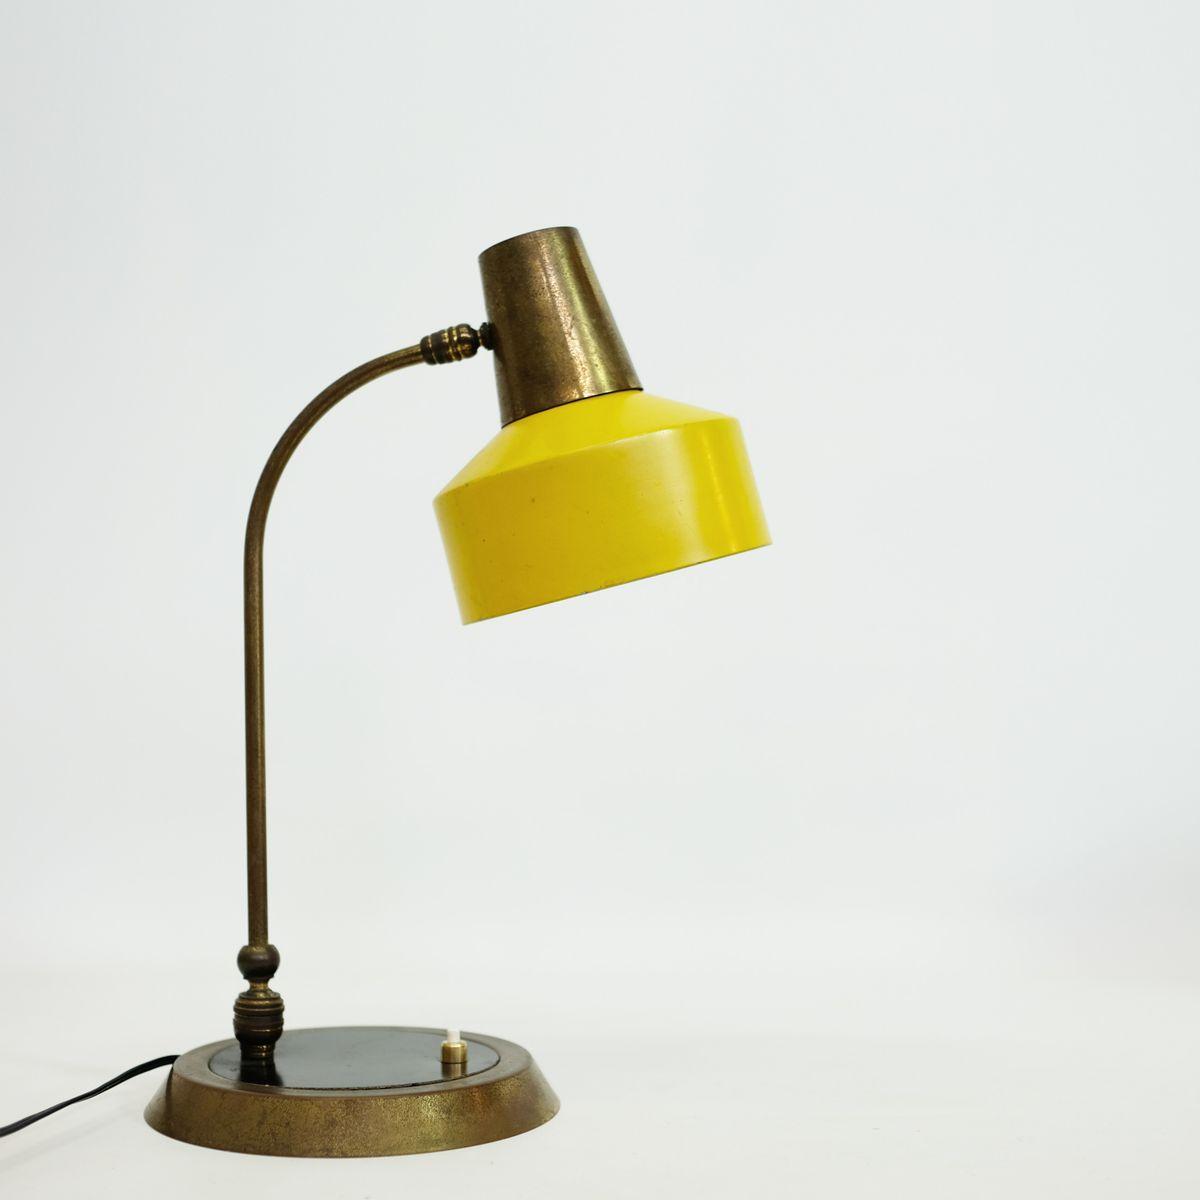 Große Französische Messing & Bakelit Tischlampe, 1960er